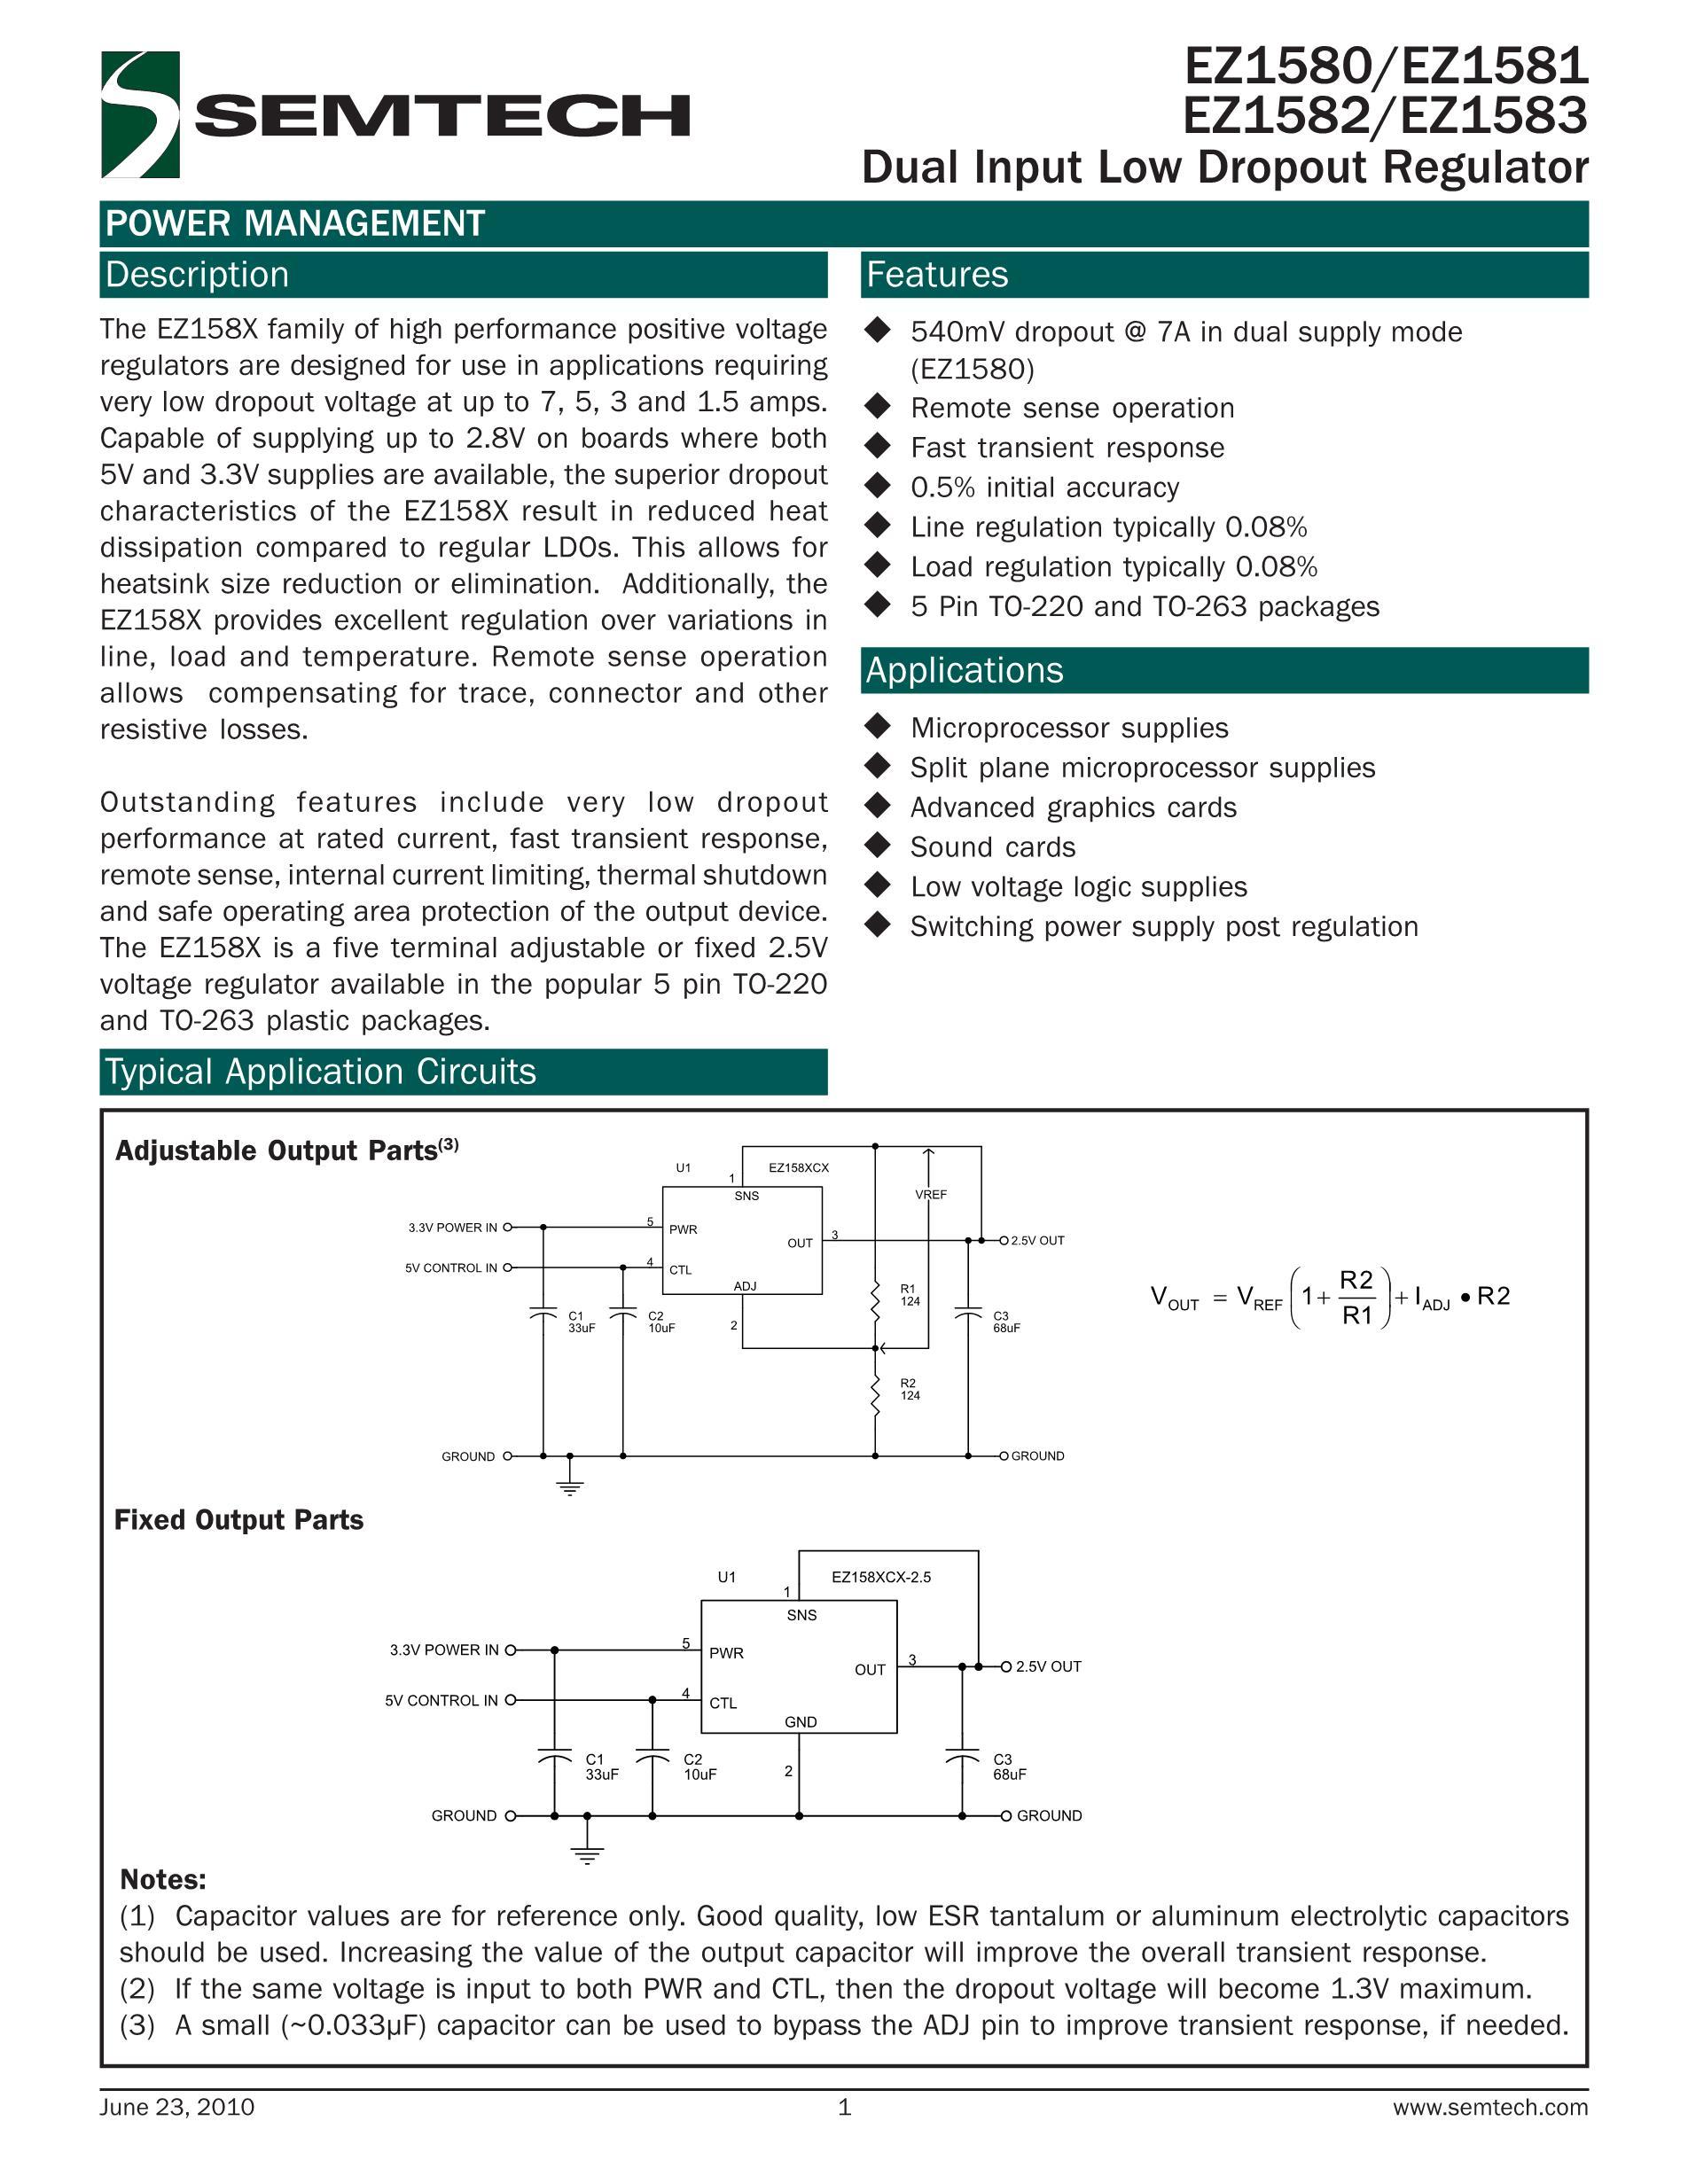 CM-2M2012-181JT's pdf picture 1